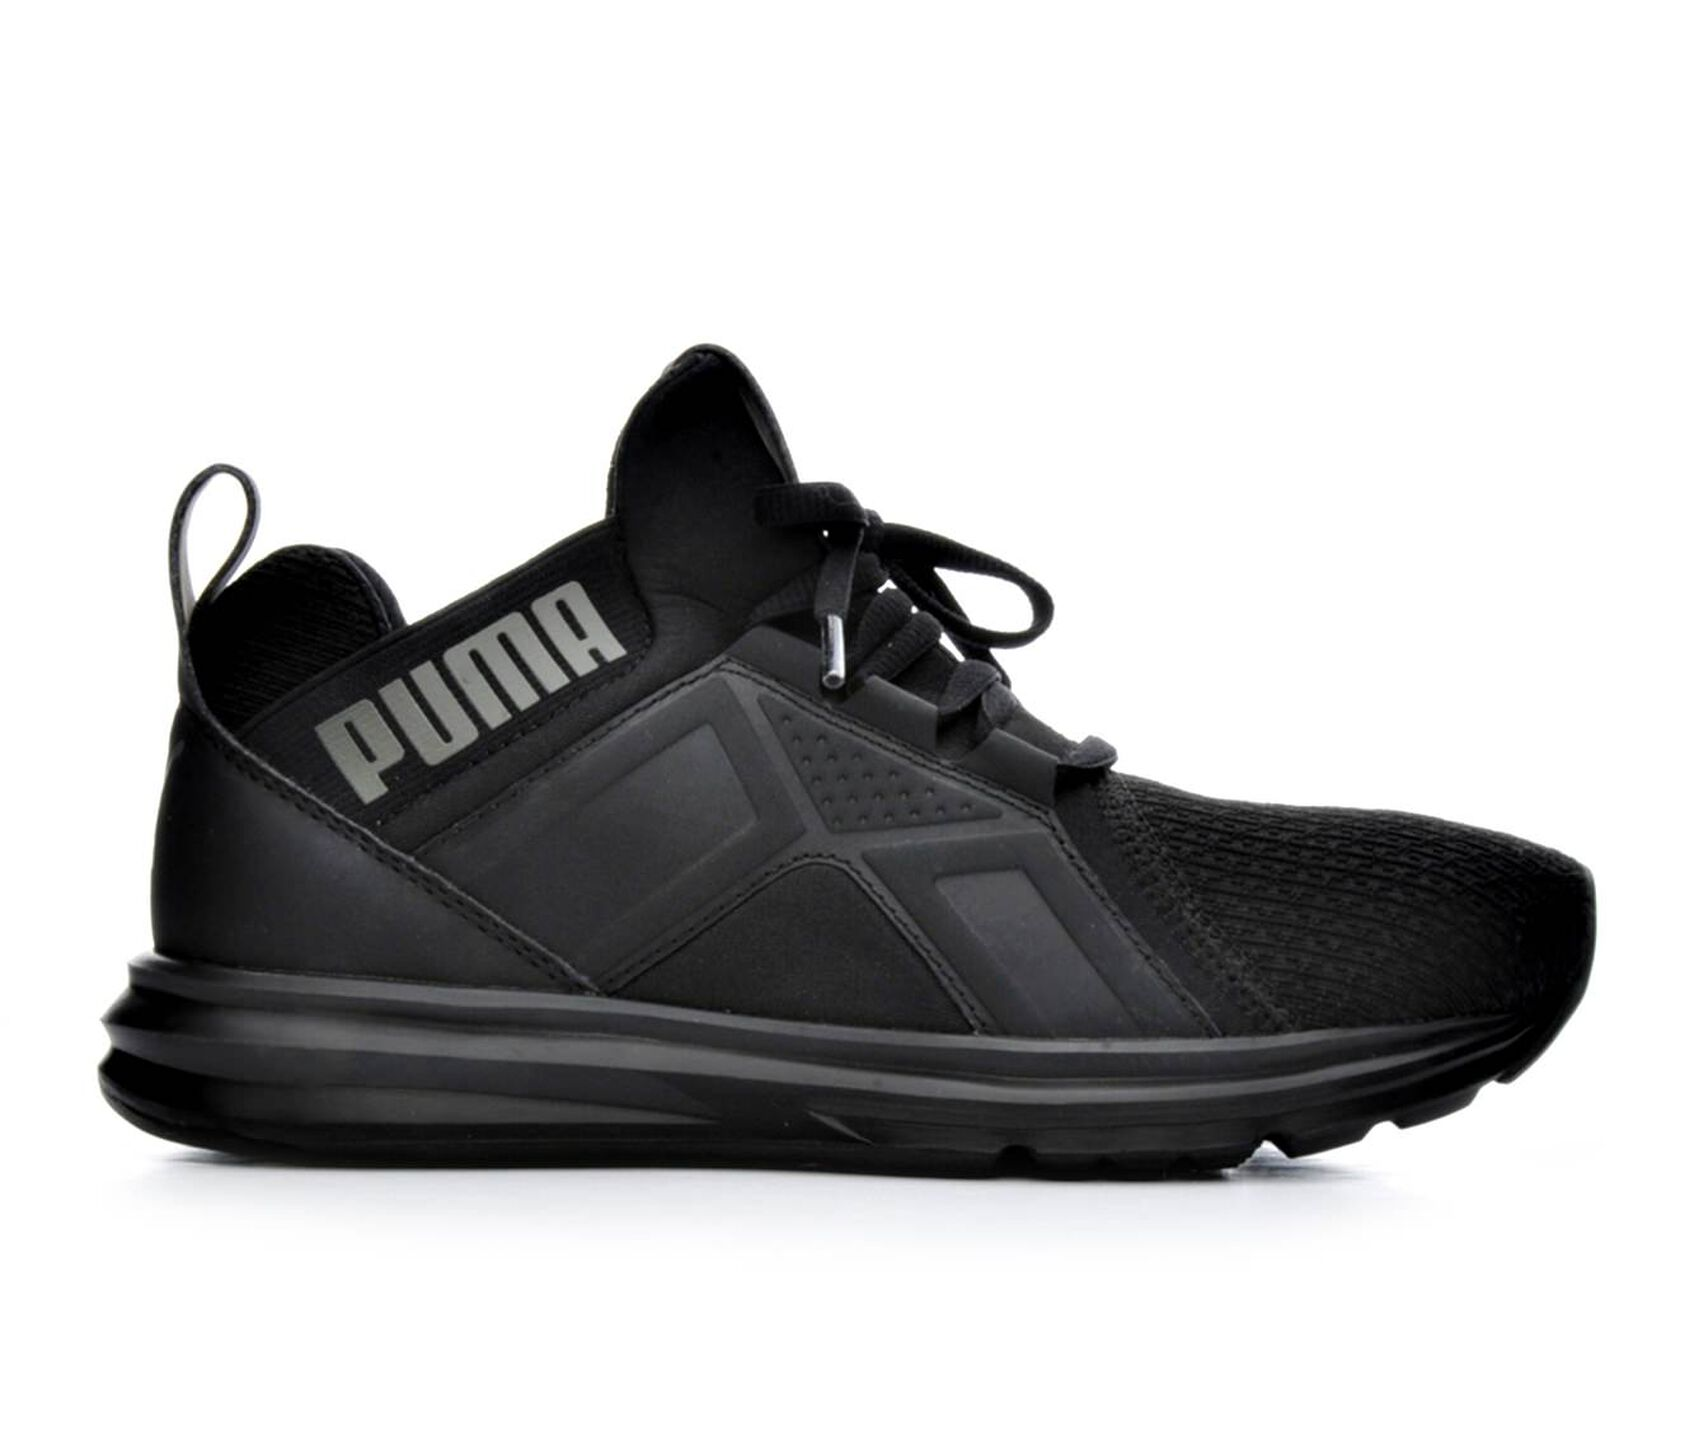 c869d539a2a Boys' Puma Big Kid Enzo Jr High Top Slip-On Sneakers | Shoe Carnival